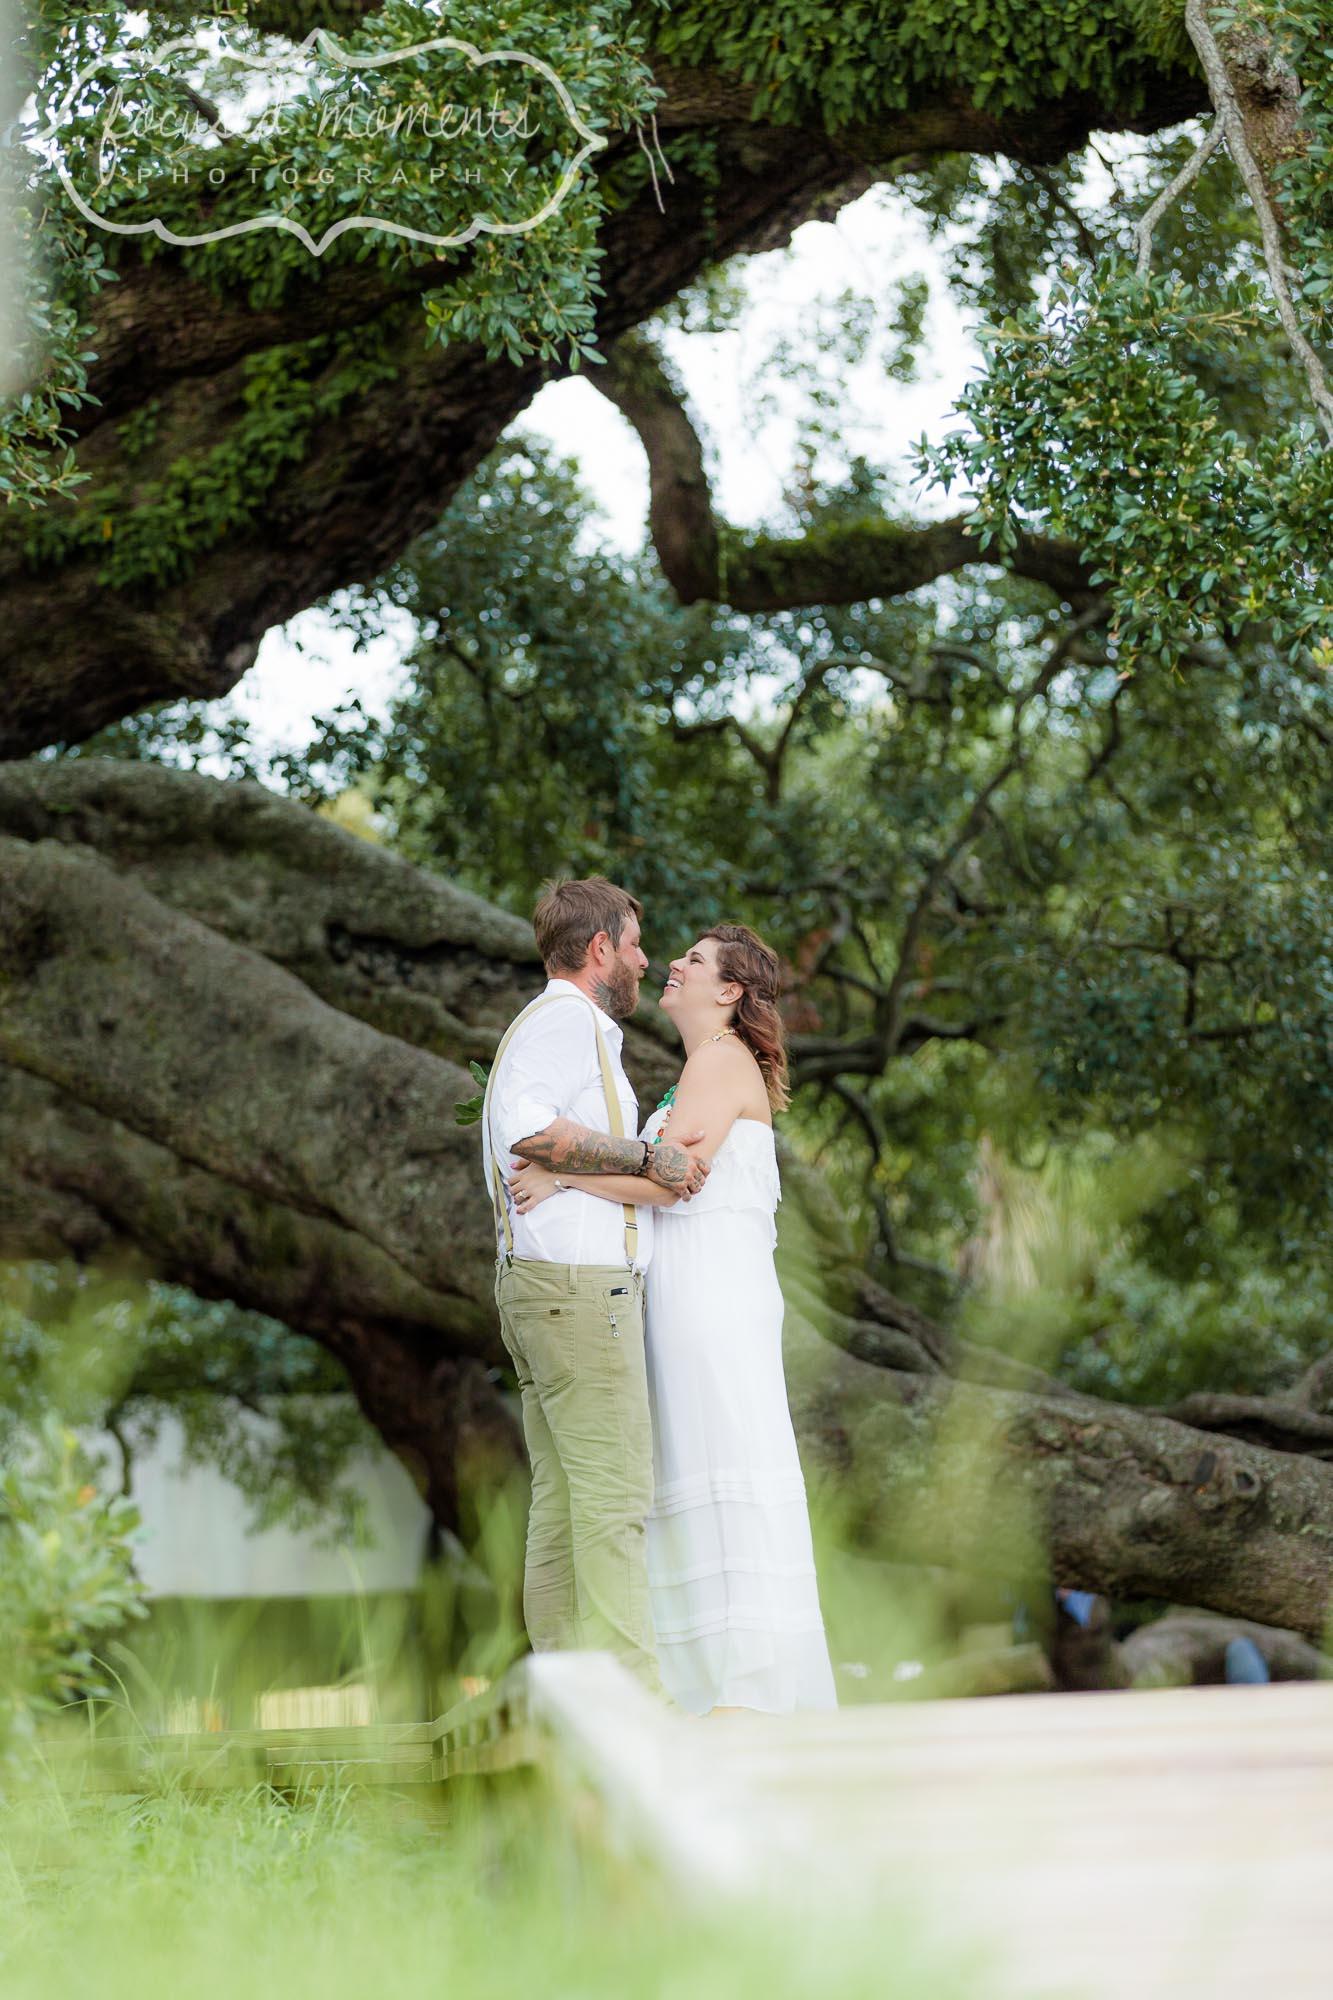 2013_08_03_Treaty_Oaks_Park_Jacksonville_Engagement_Photography_13.jpg